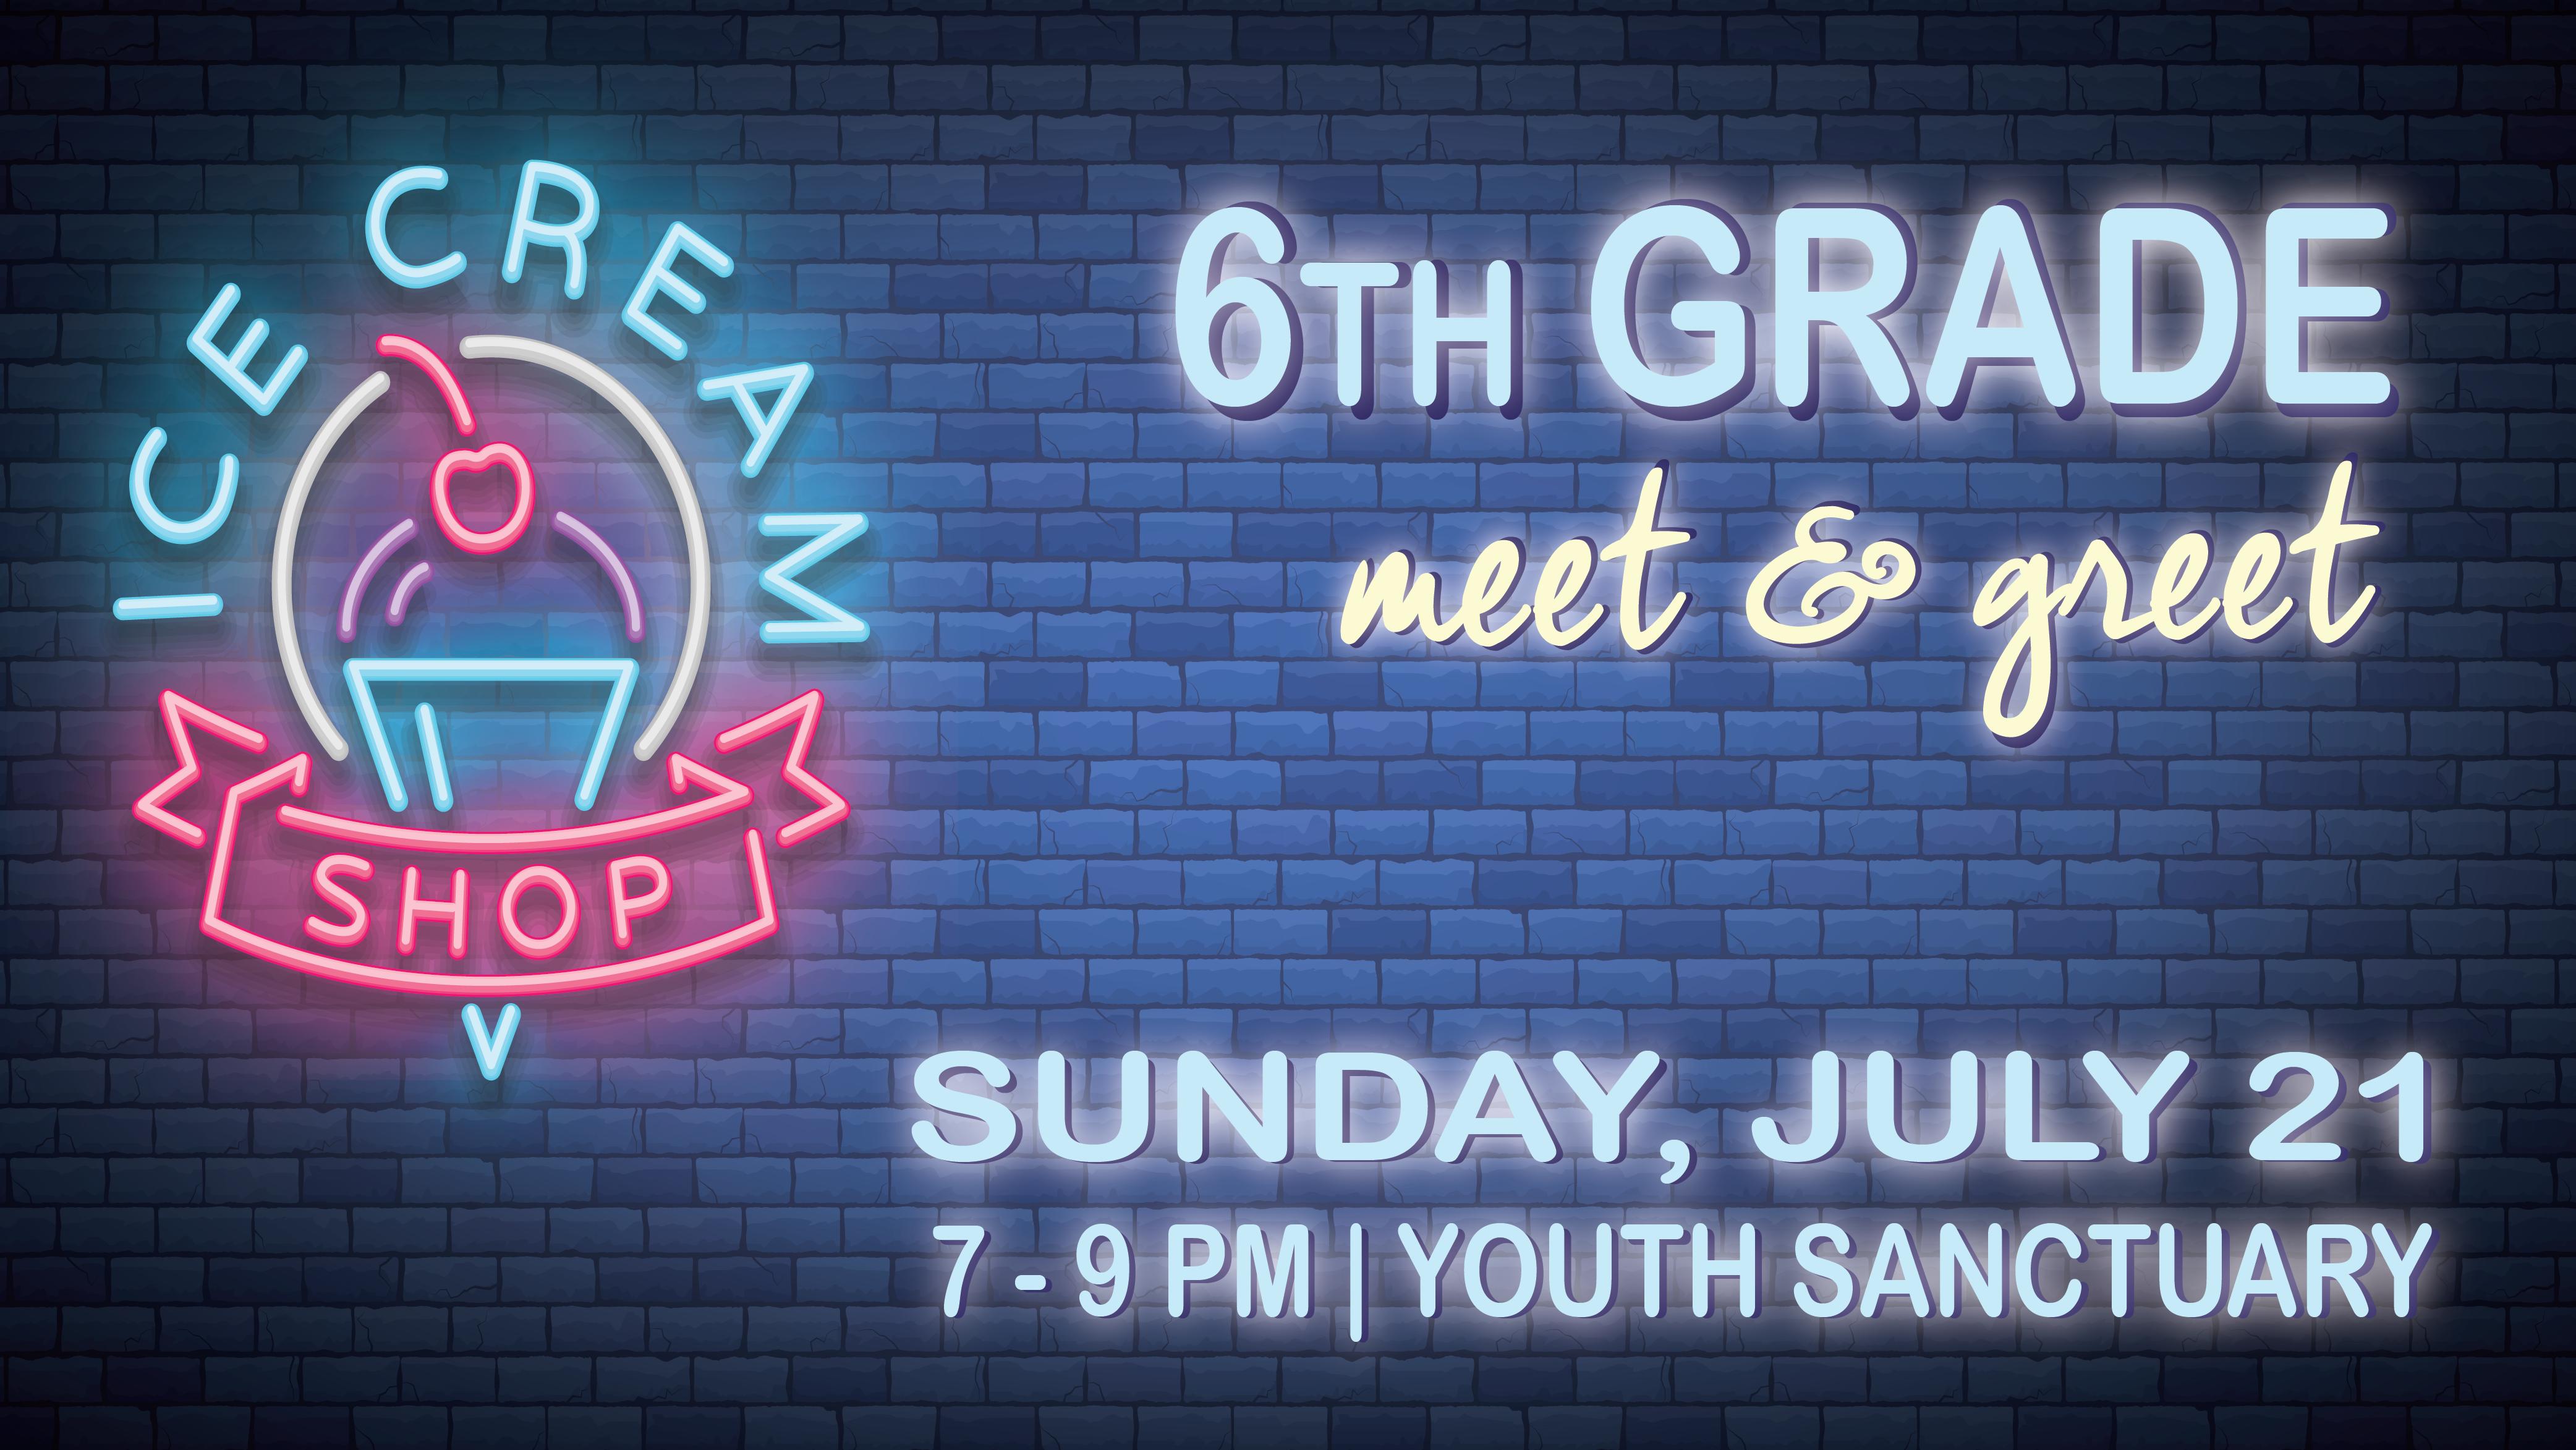 6th Grade Meet & Greet